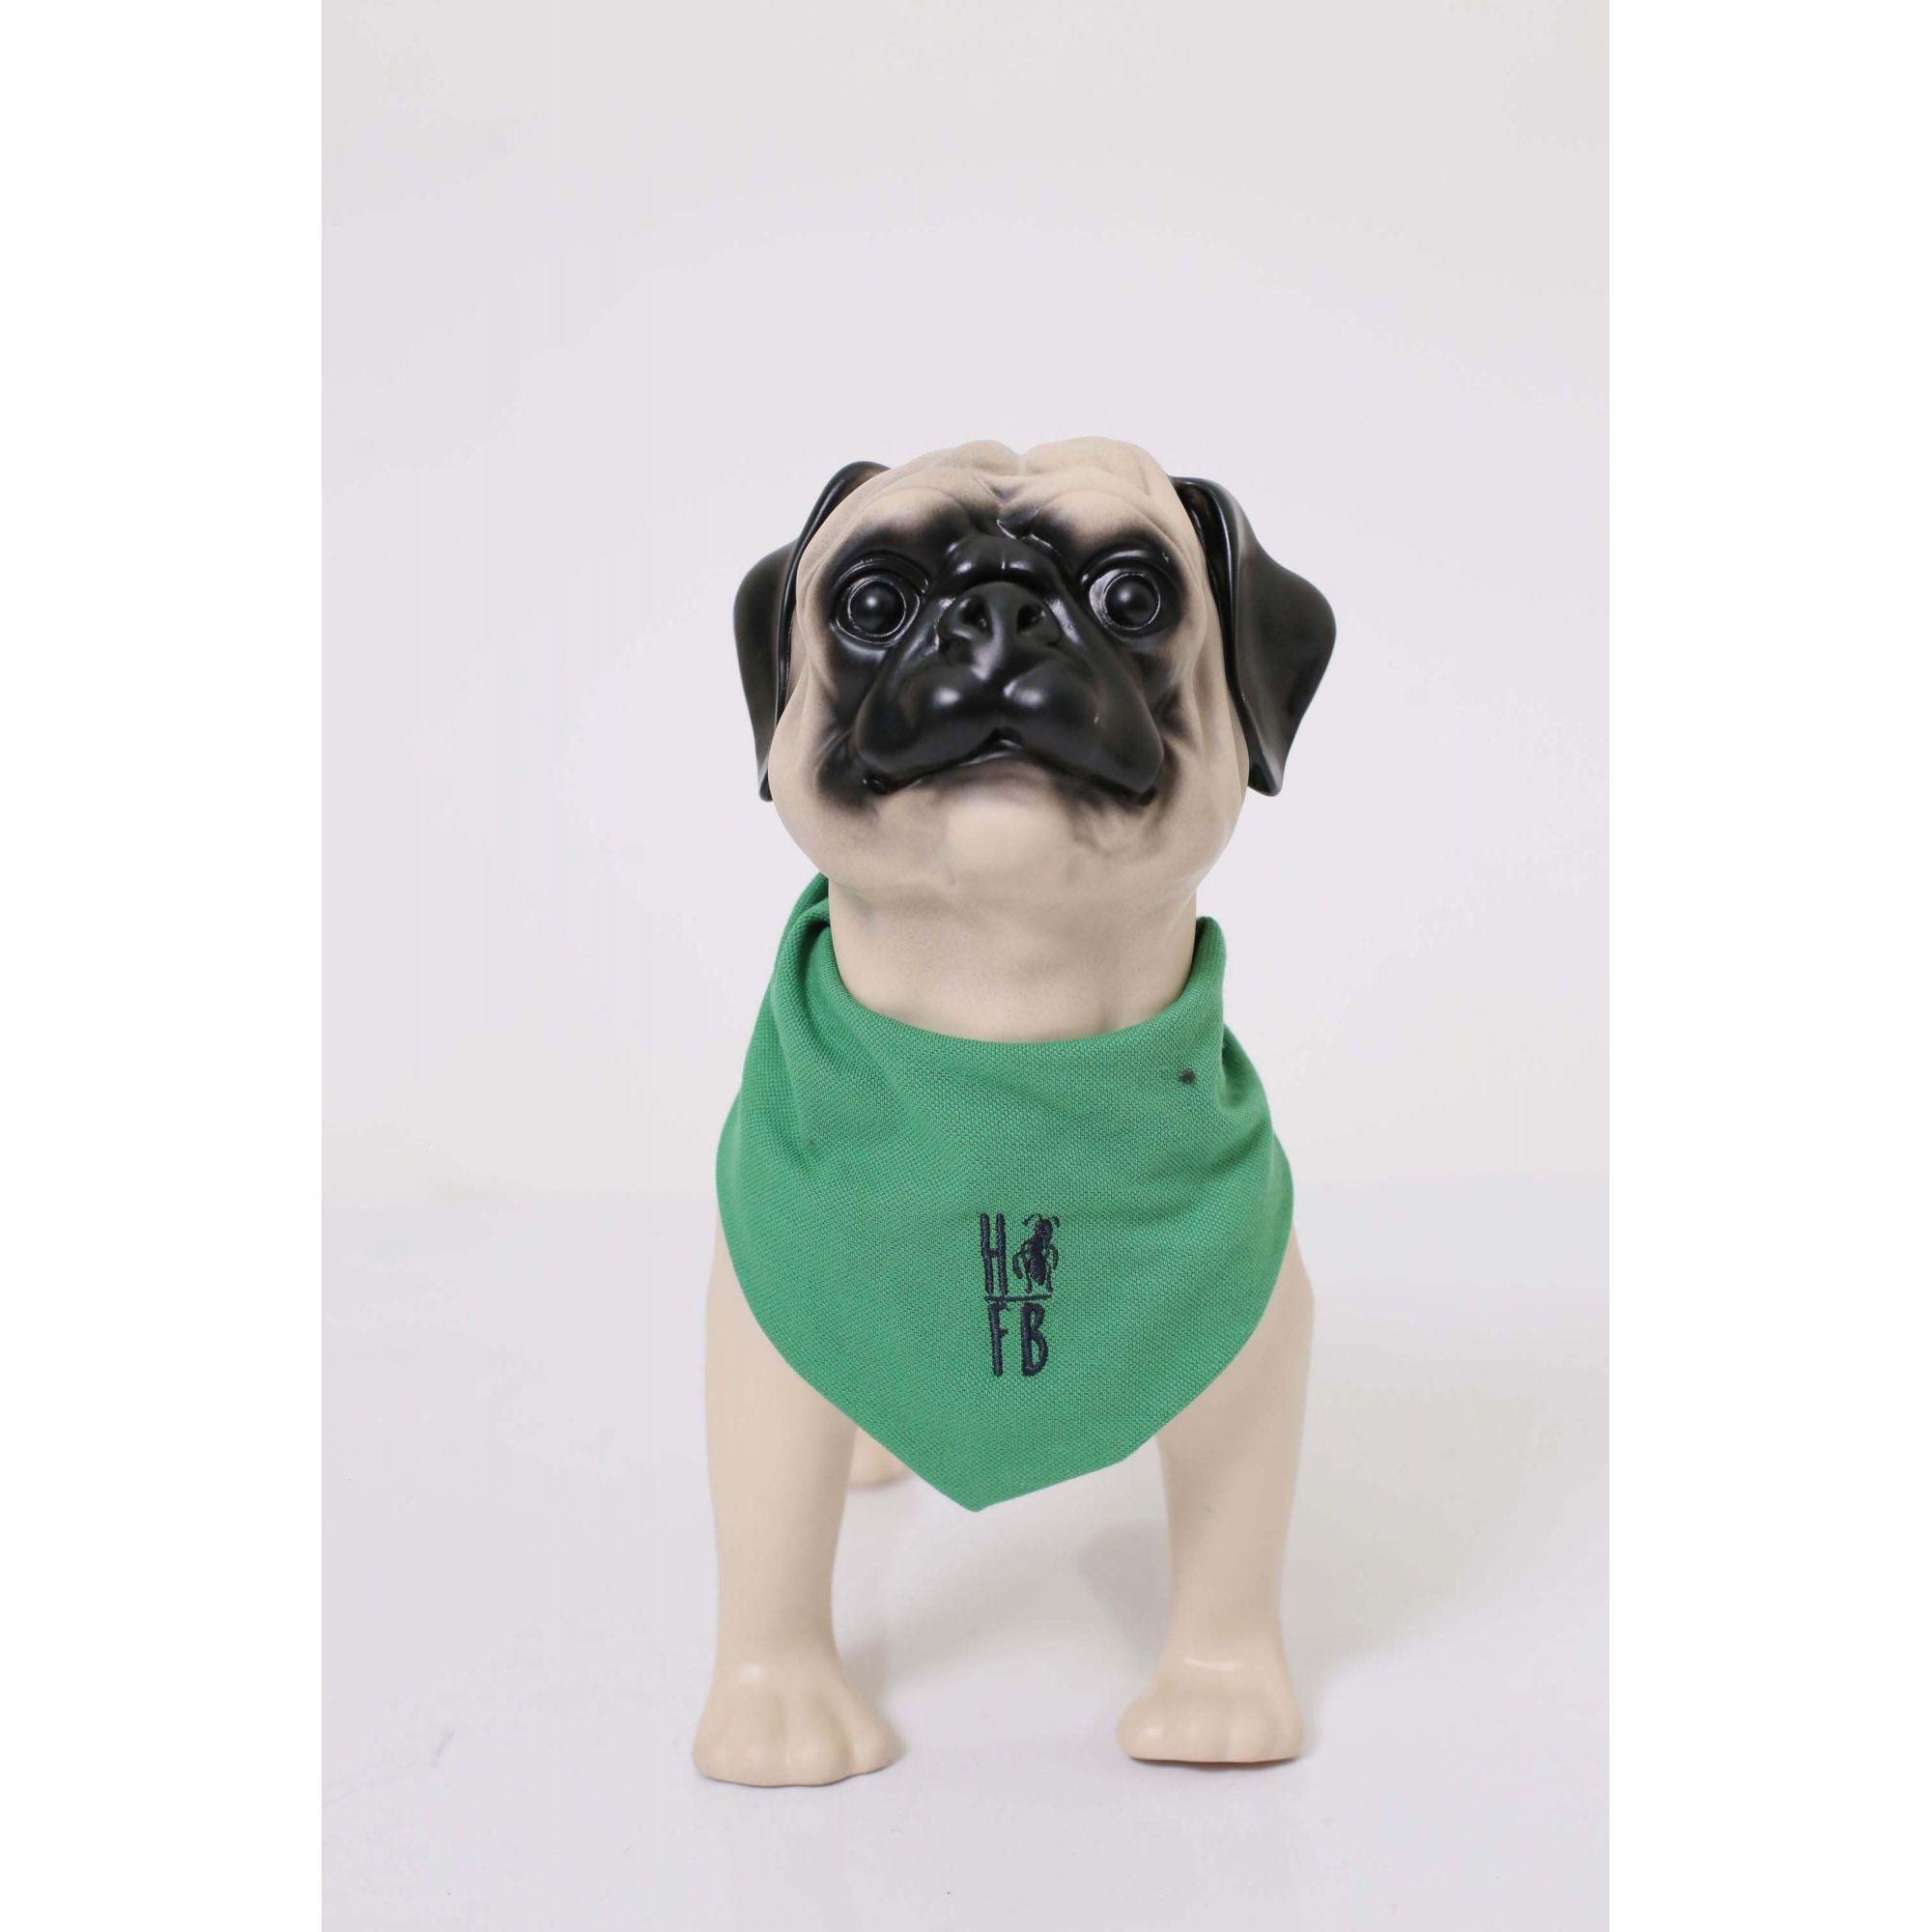 Bandana Pet Verde Esperança  - Heitor Fashion Brazil